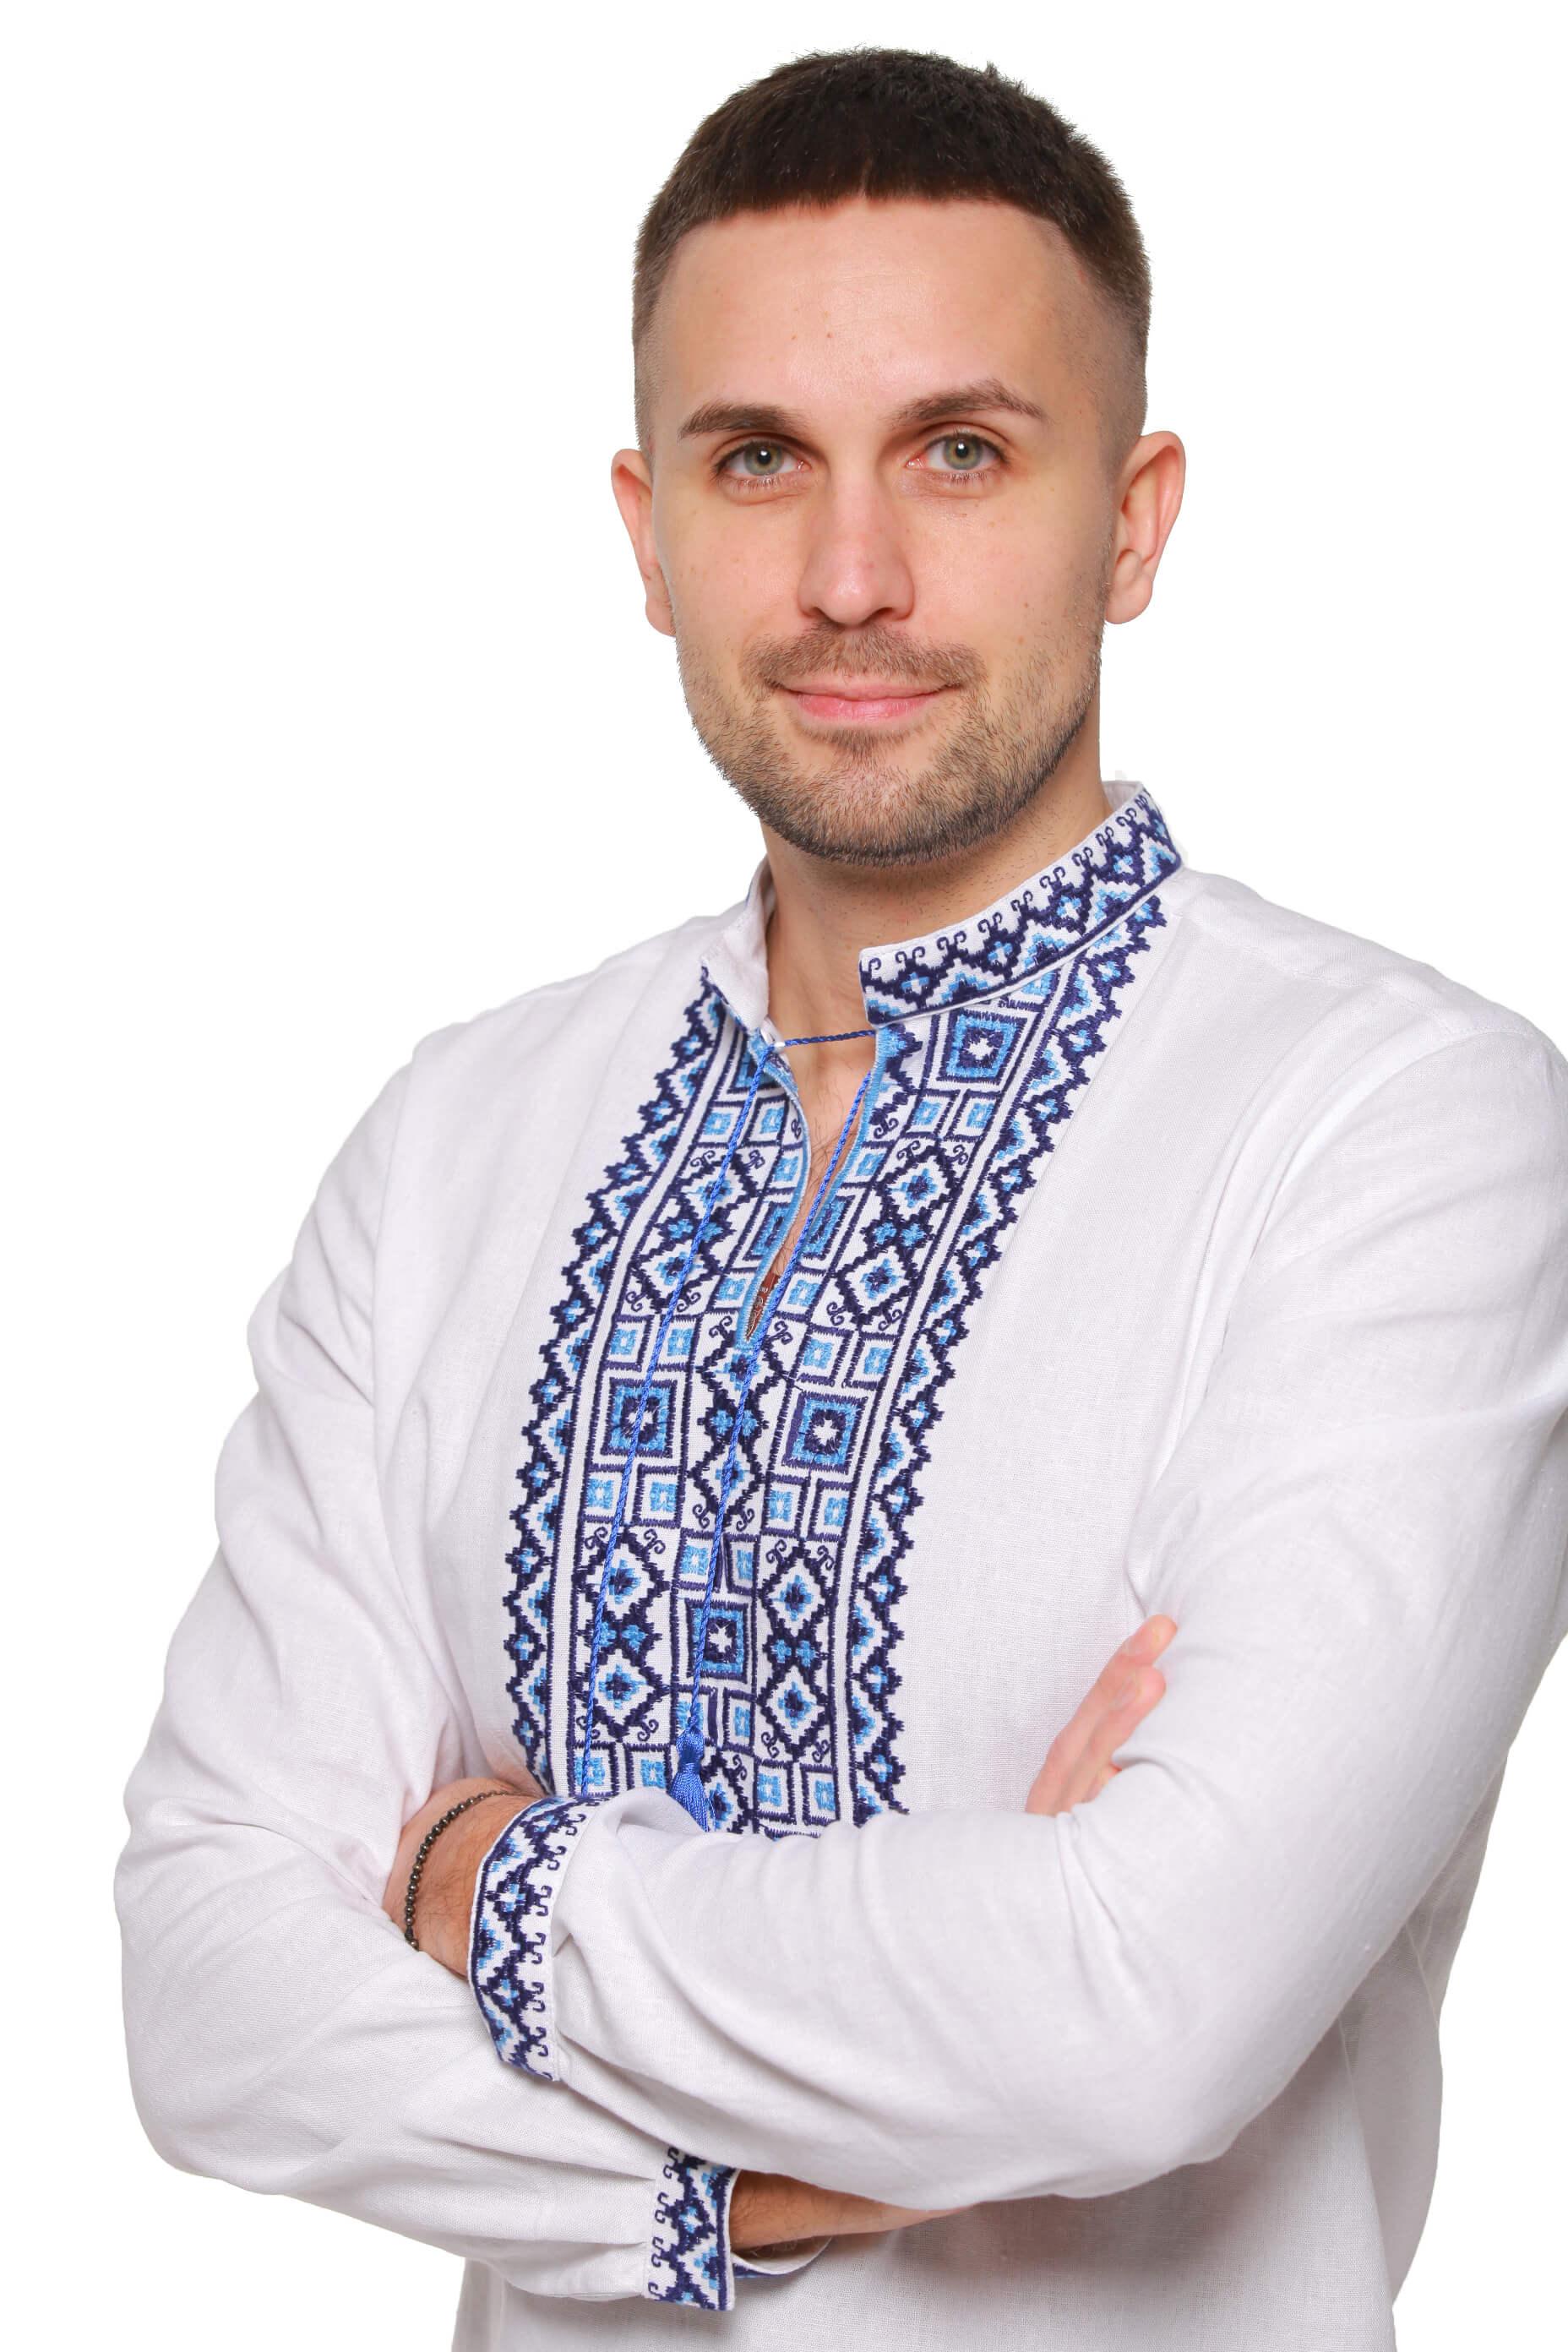 Вишиванка чоловіча. Купити чоловічі вишиванки в Києві — 2KOLYORY. 3cbb37e23ae1d